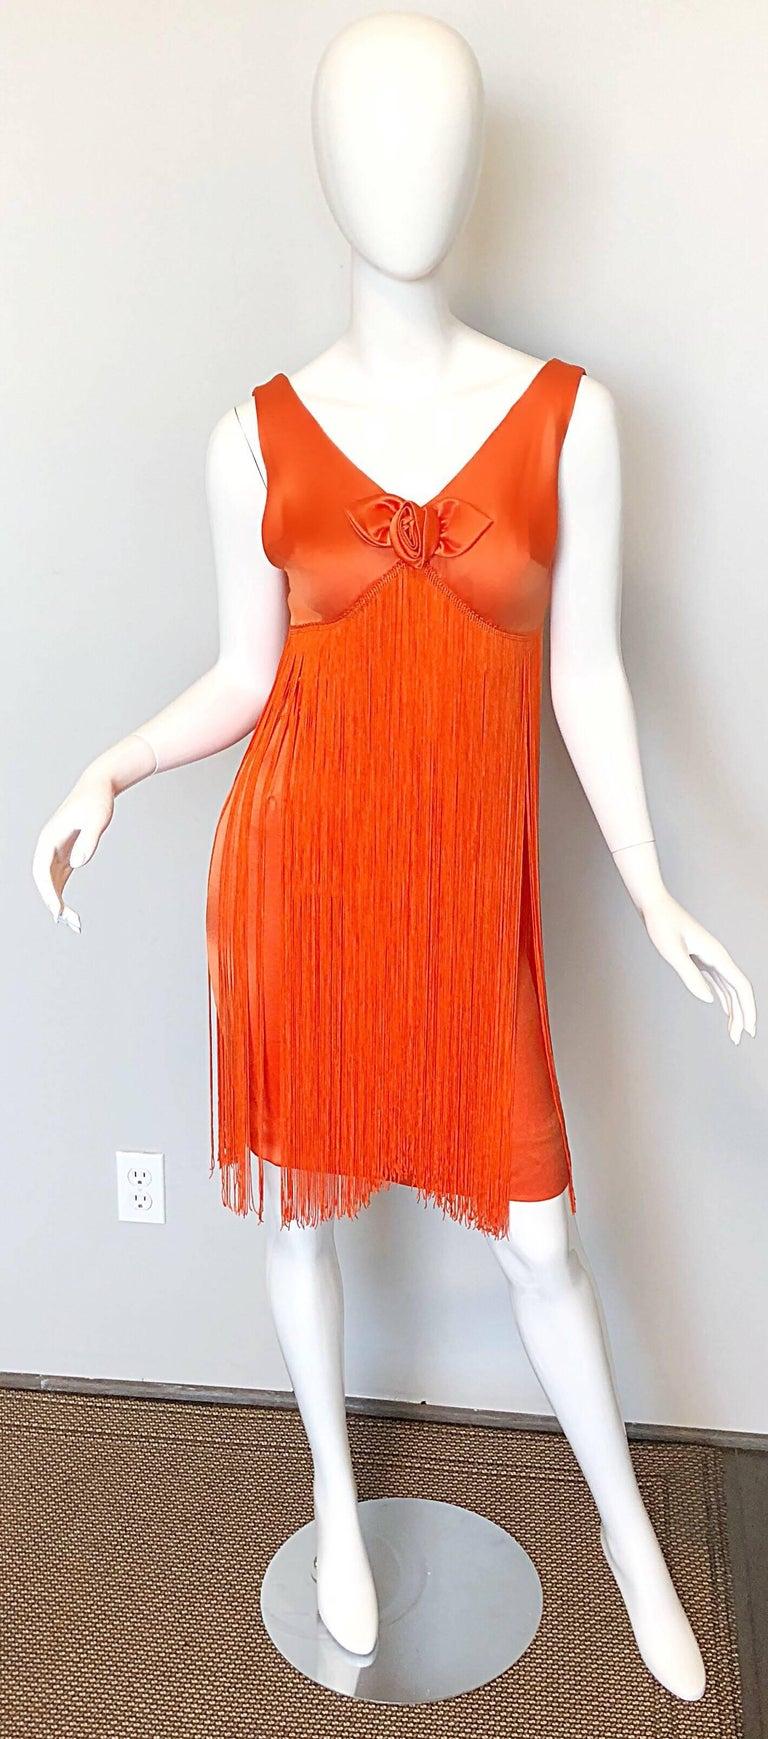 Joseph Magnin 1960s Amazing Bright Orange Fully Fringe Flapper Jersey 60s Dress For Sale 4